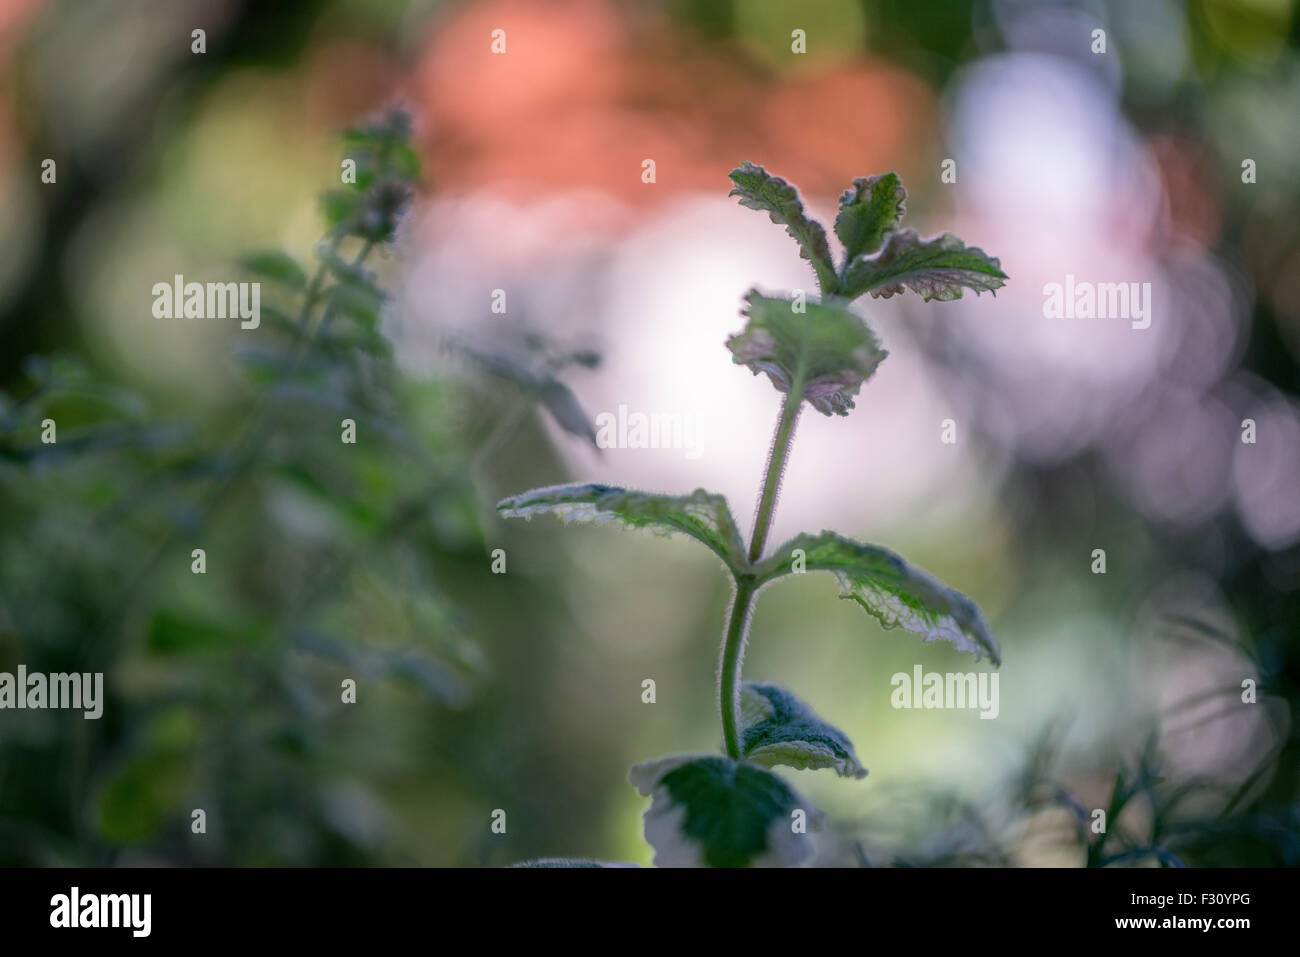 Sprudelnde Bokeh produziert von Flektogon 35/2.4 Objektiv von Carl Zeiss Jena Stockbild